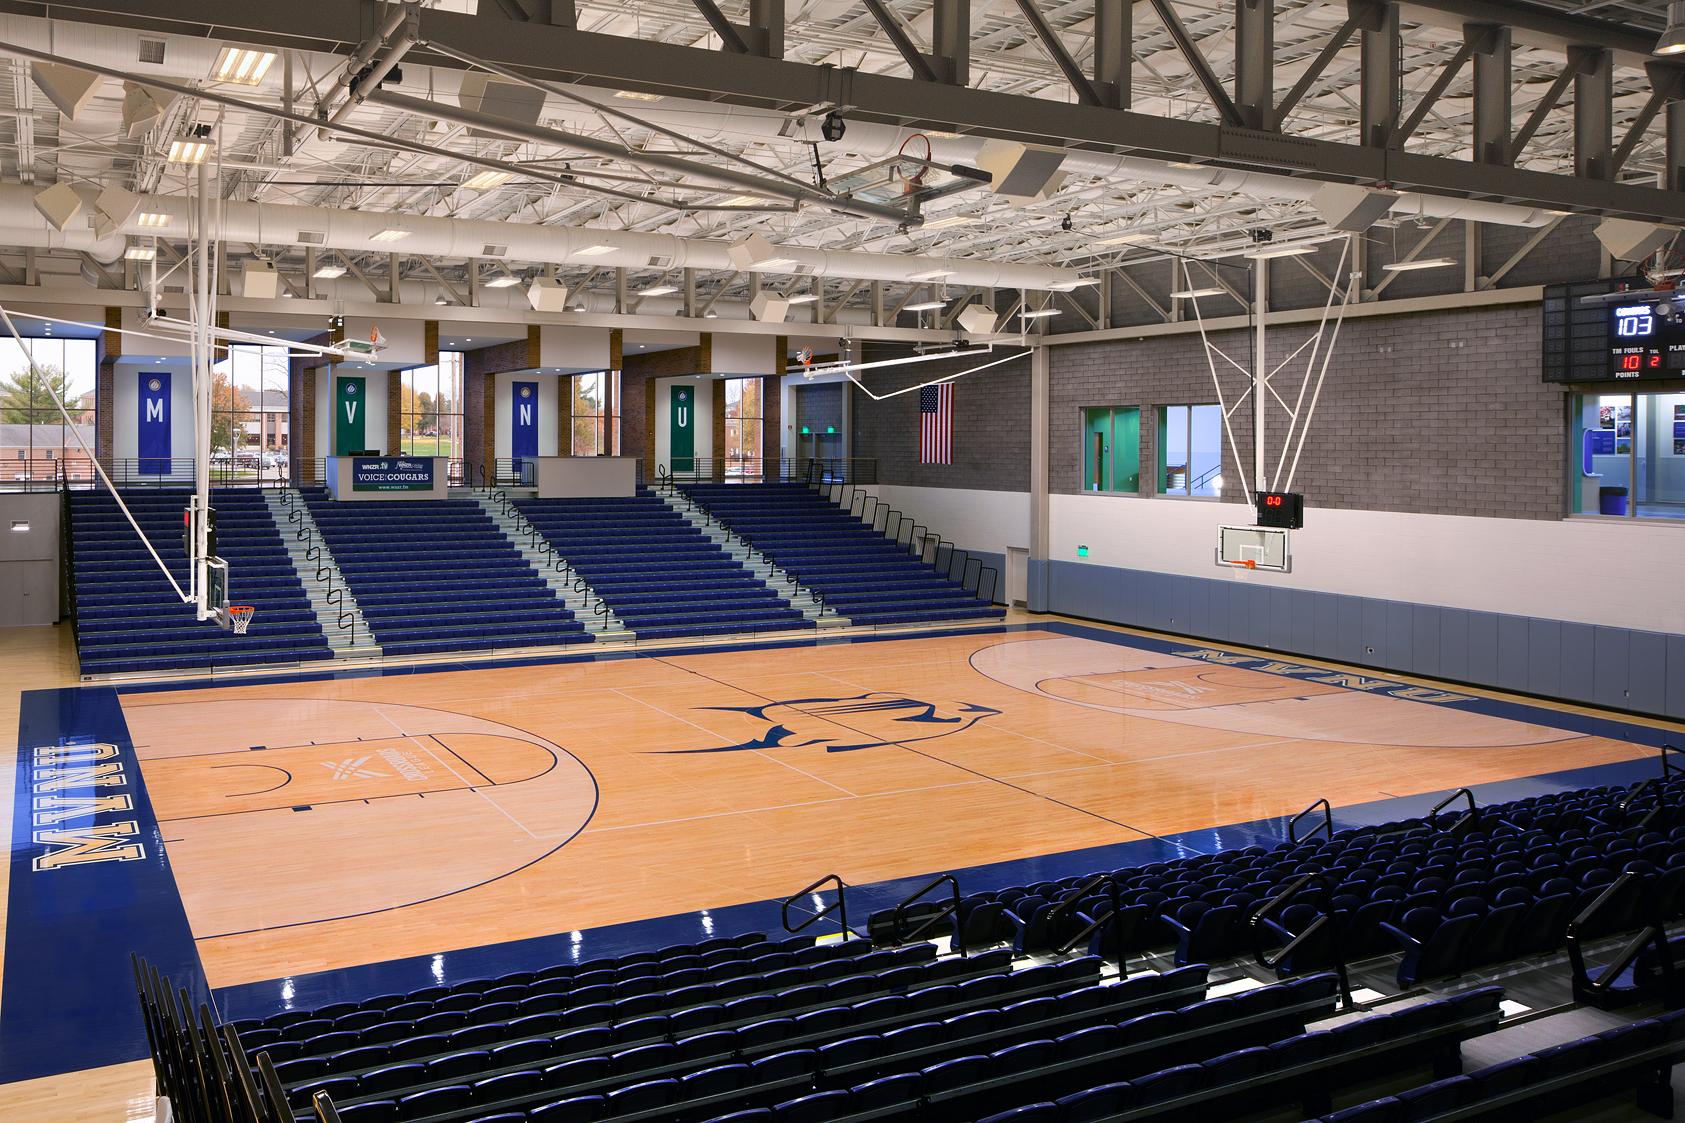 Mt. Vernon Nazarene University Ariel Arena